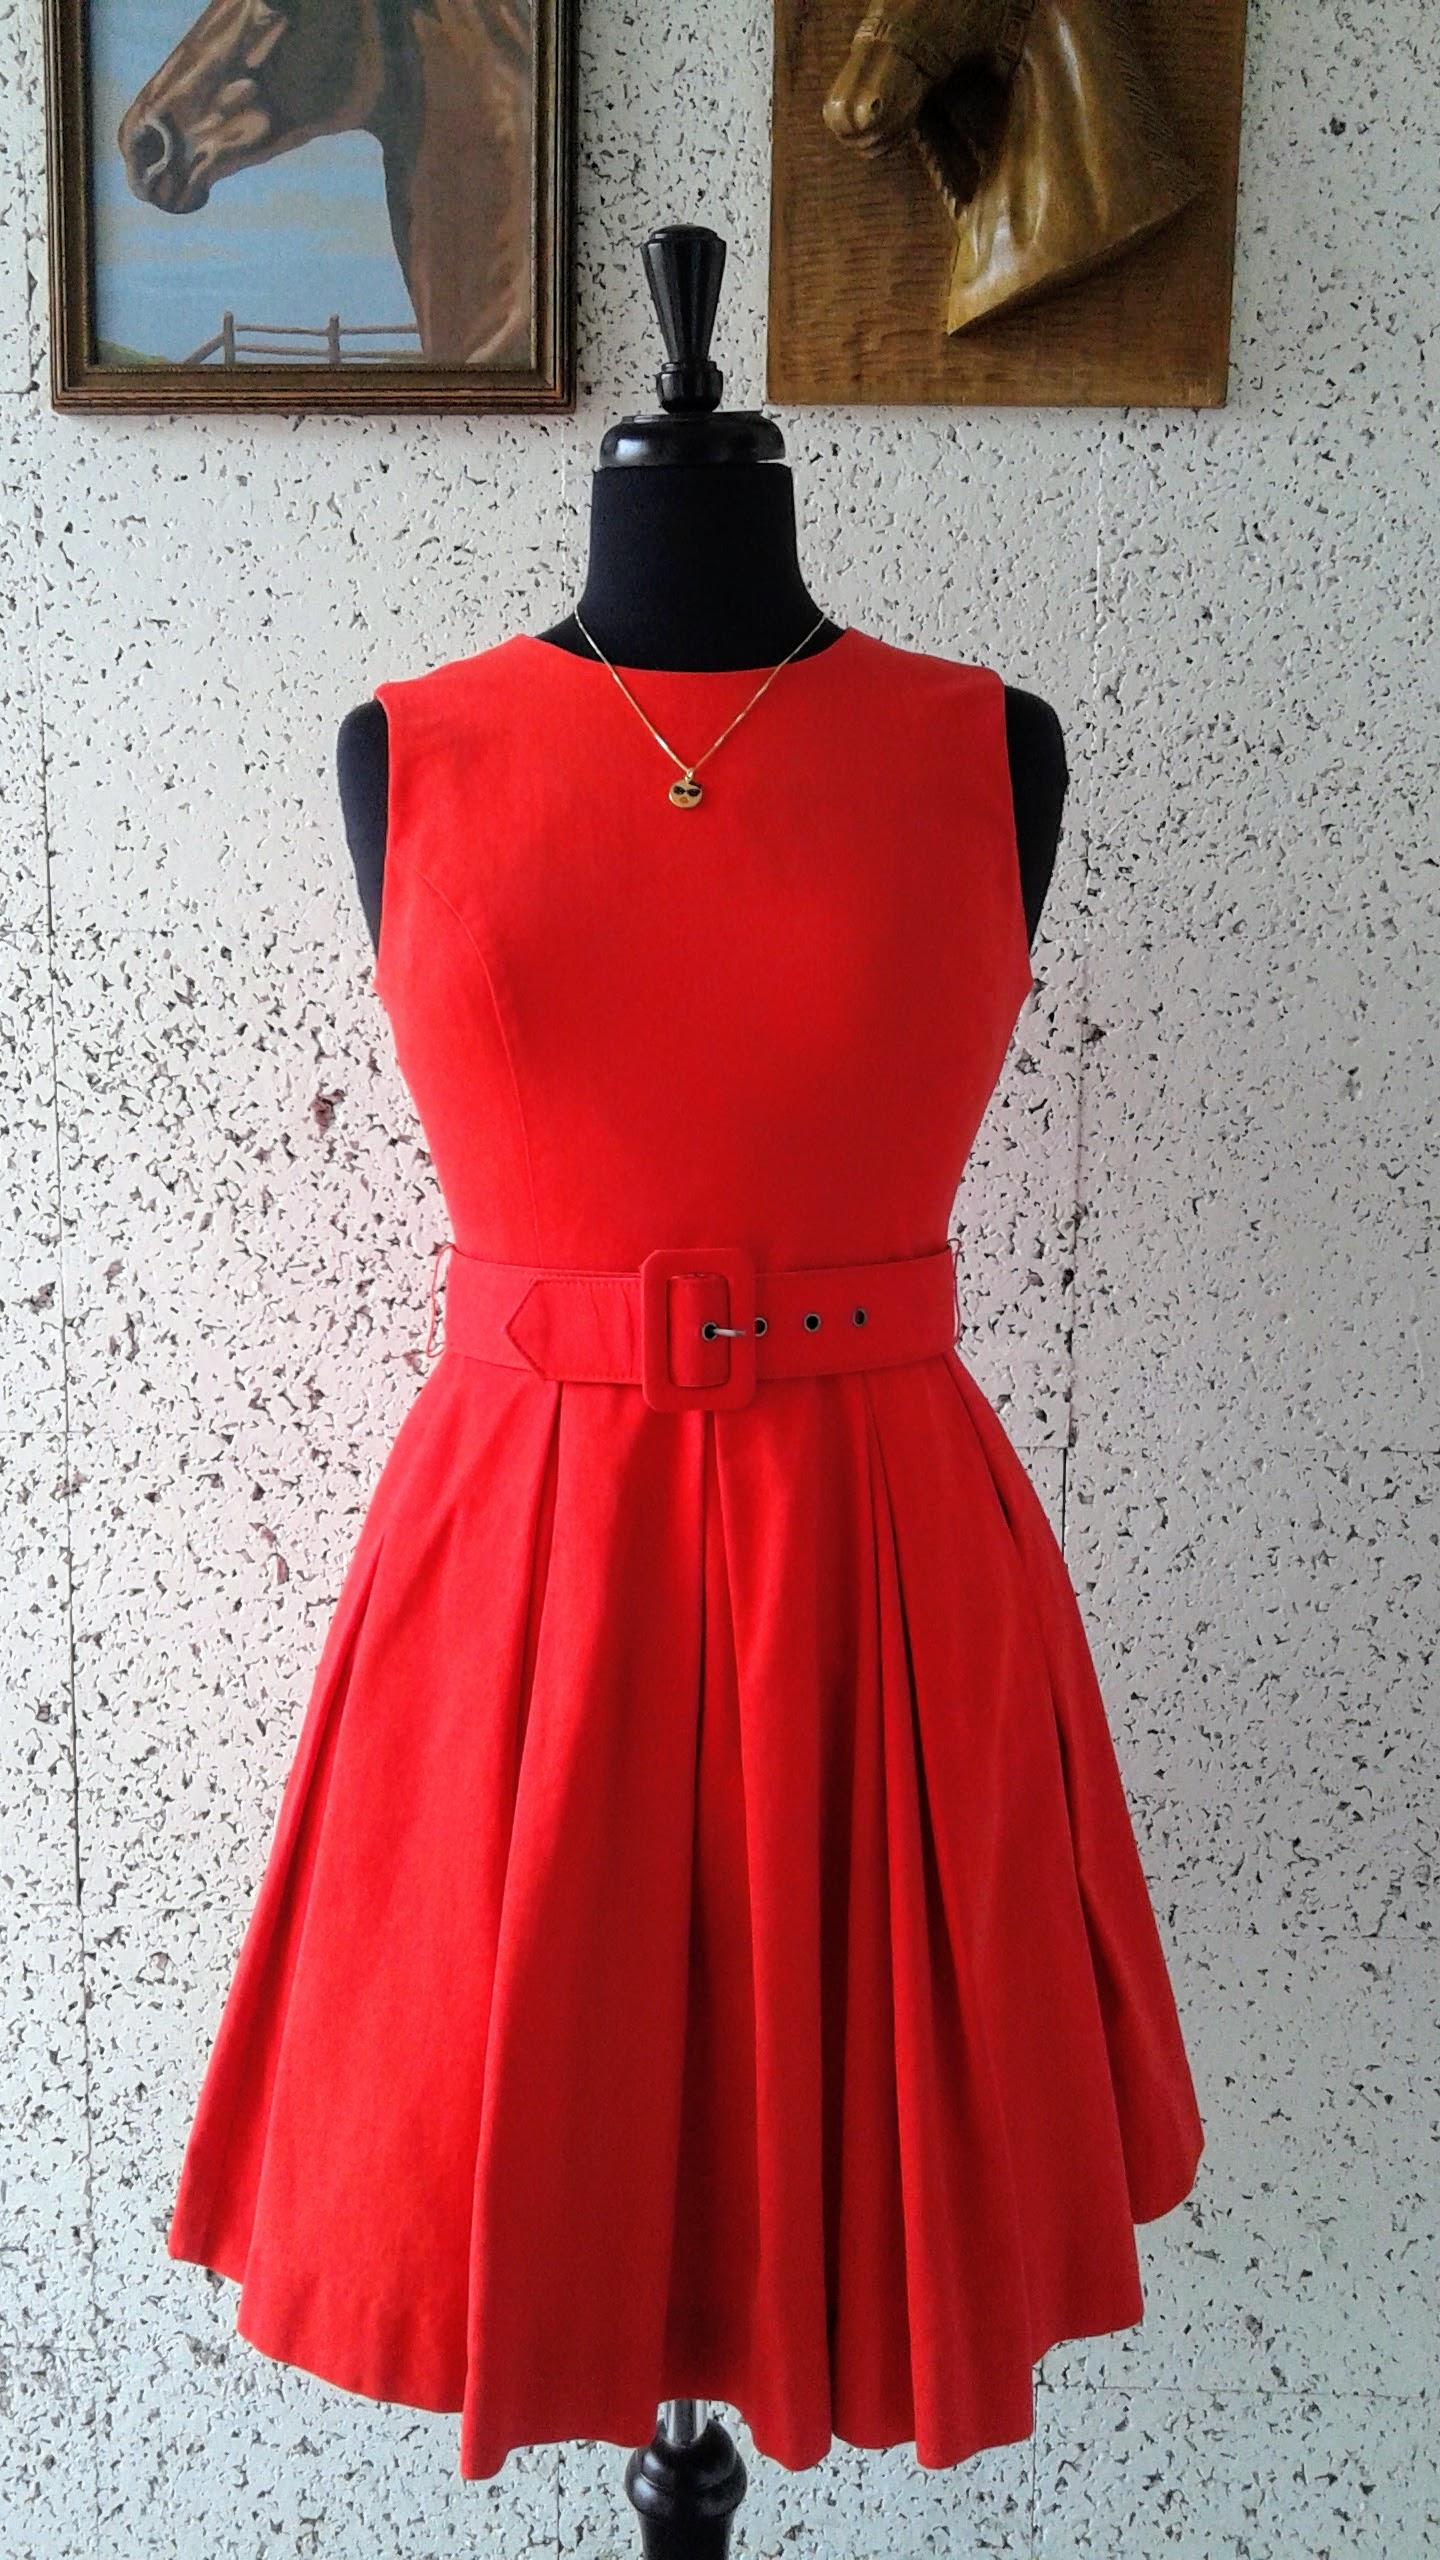 BB Dakota dress; Size 4, $38